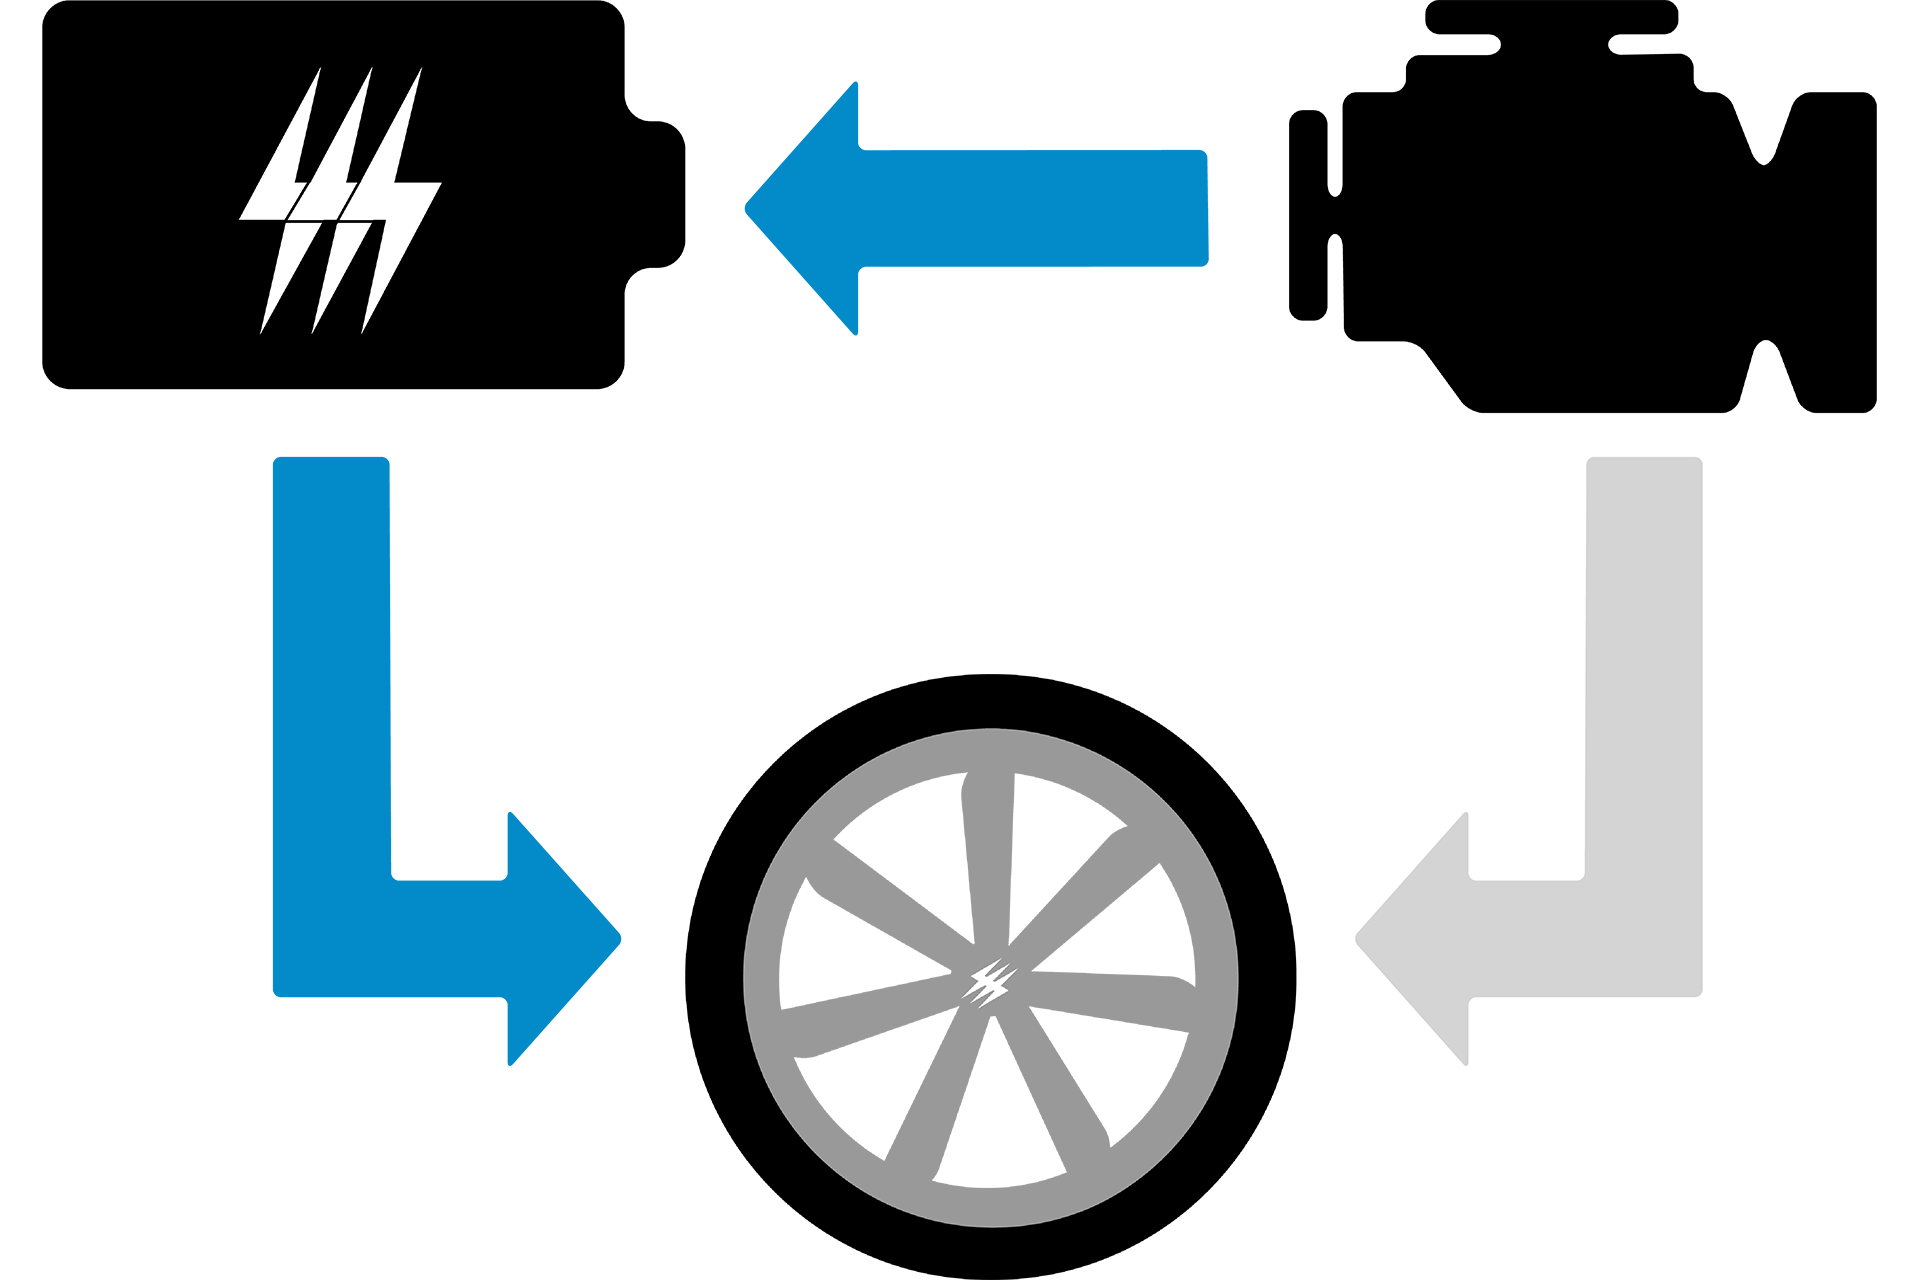 Series Hybrid Mode